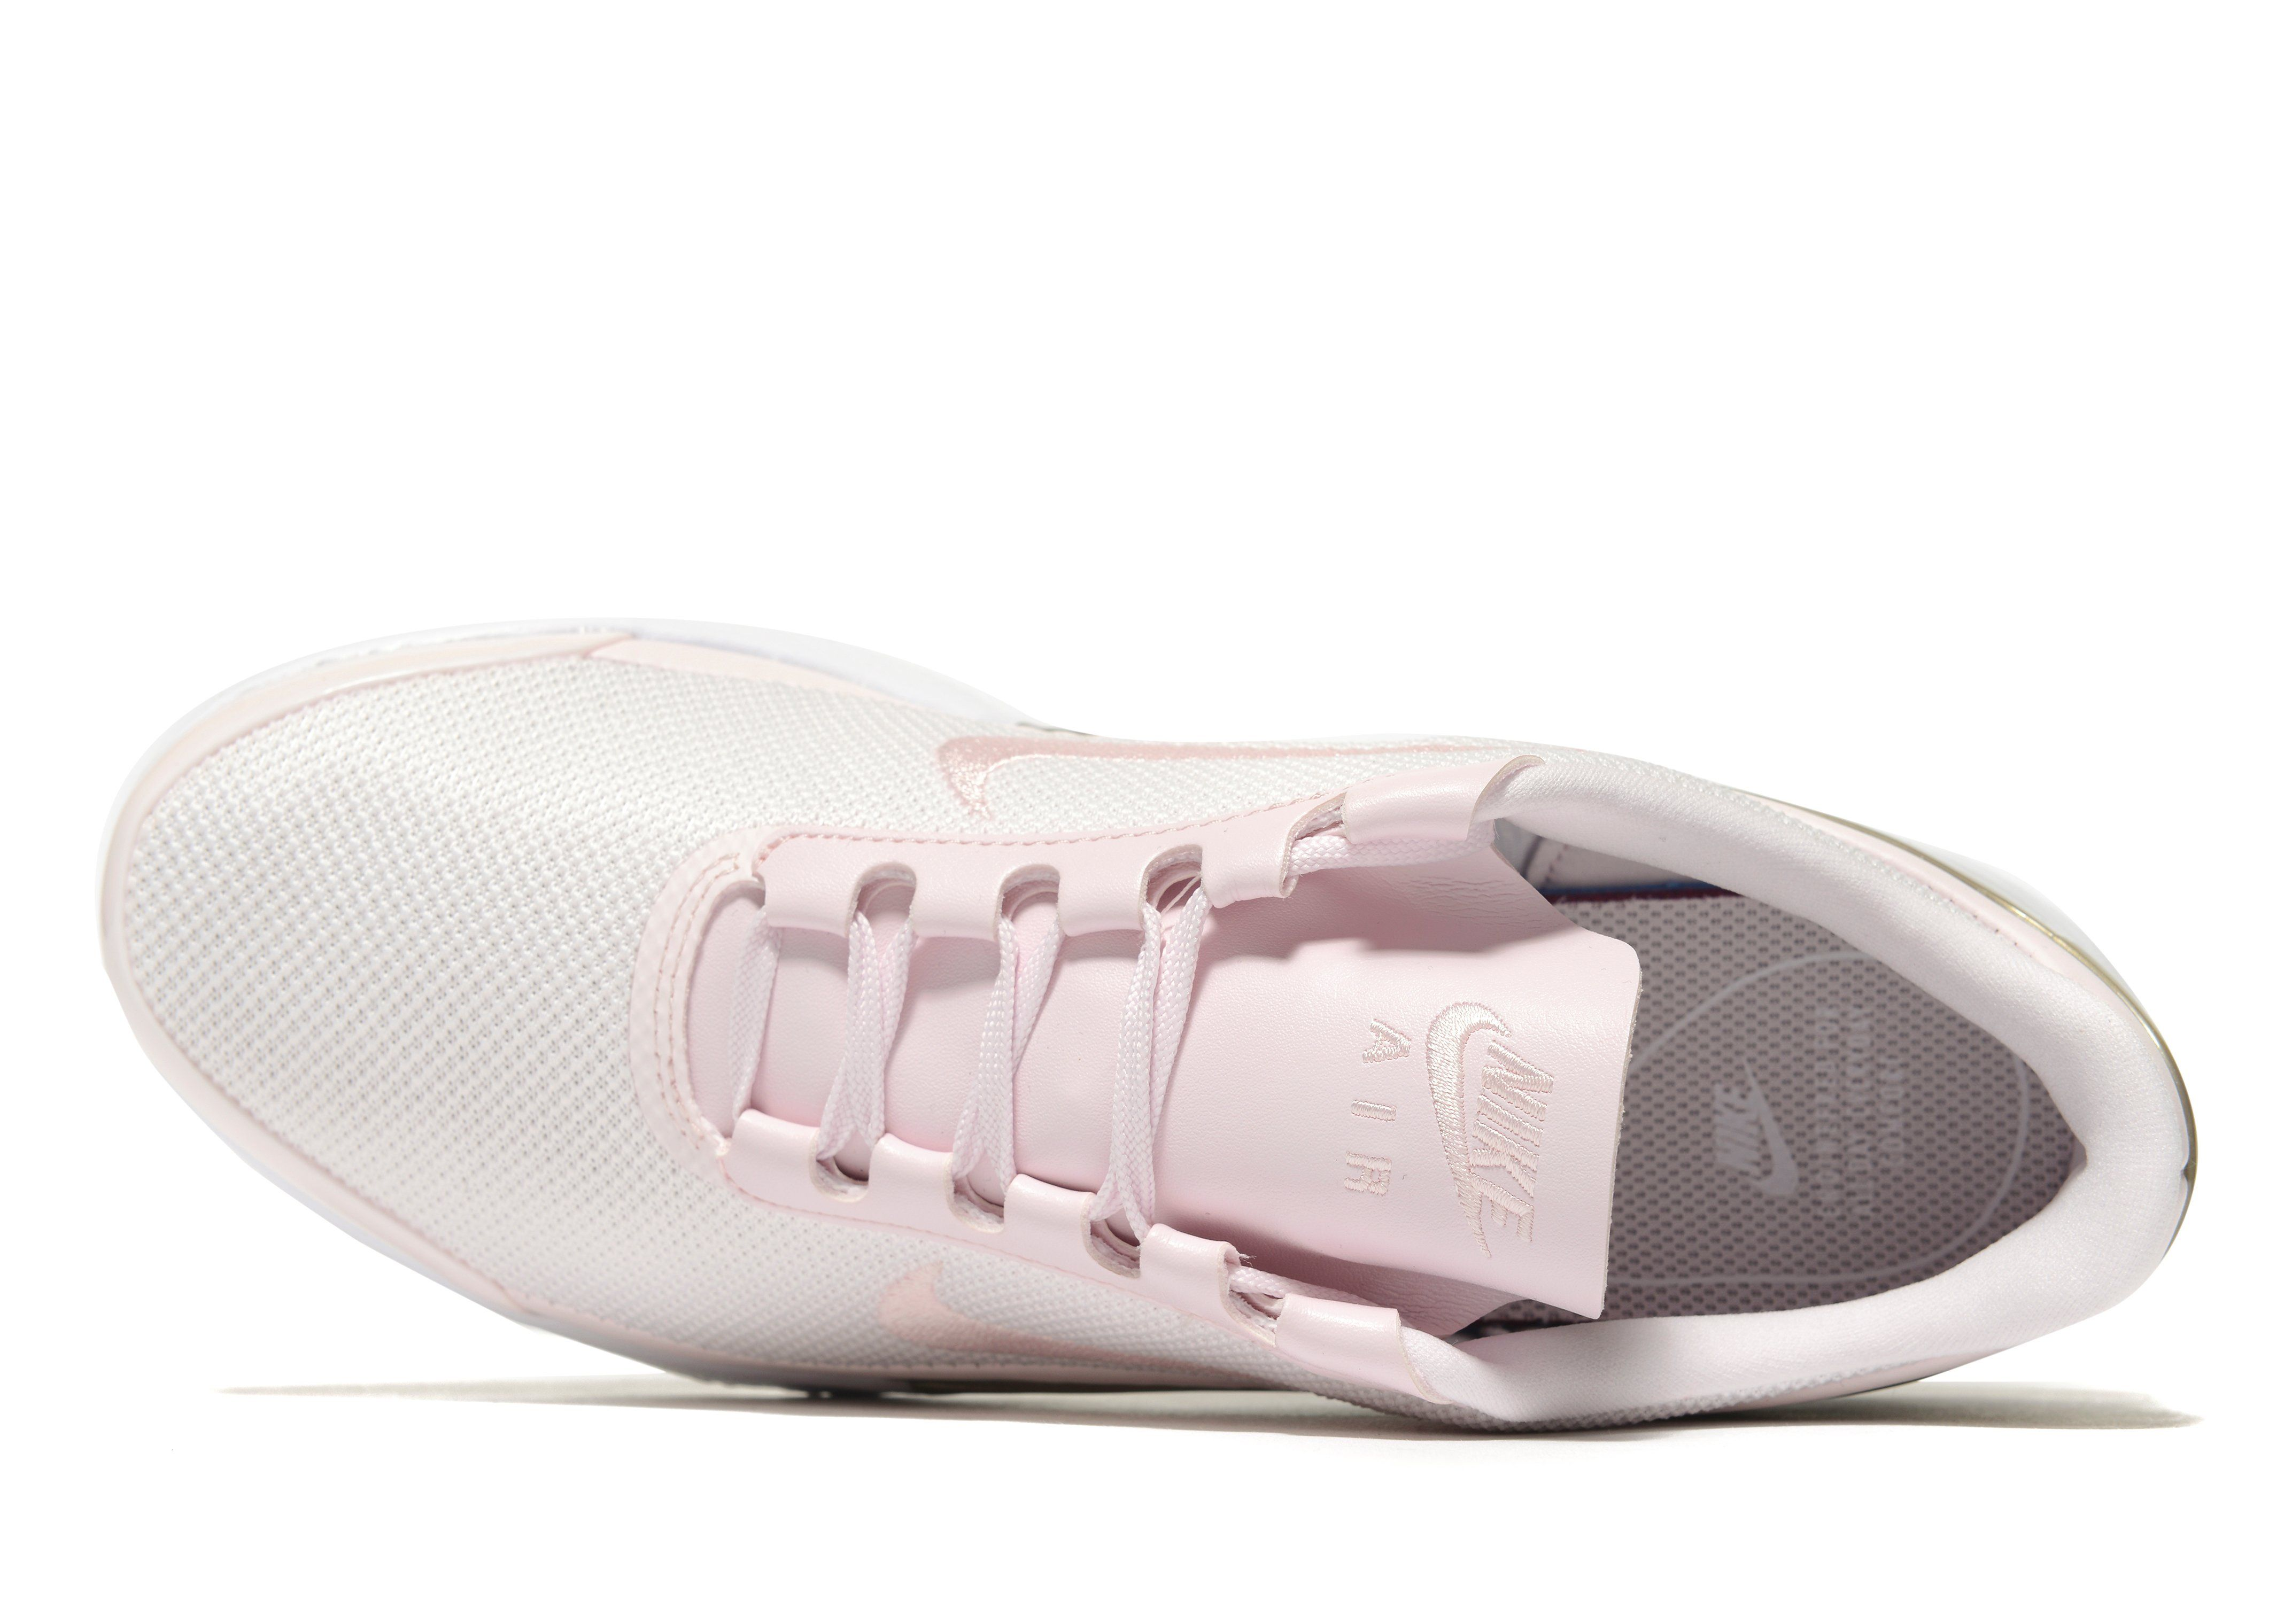 Nike Formateurs Jewell Air Max En Cuir Rose Pastel - Rose 4KXbr